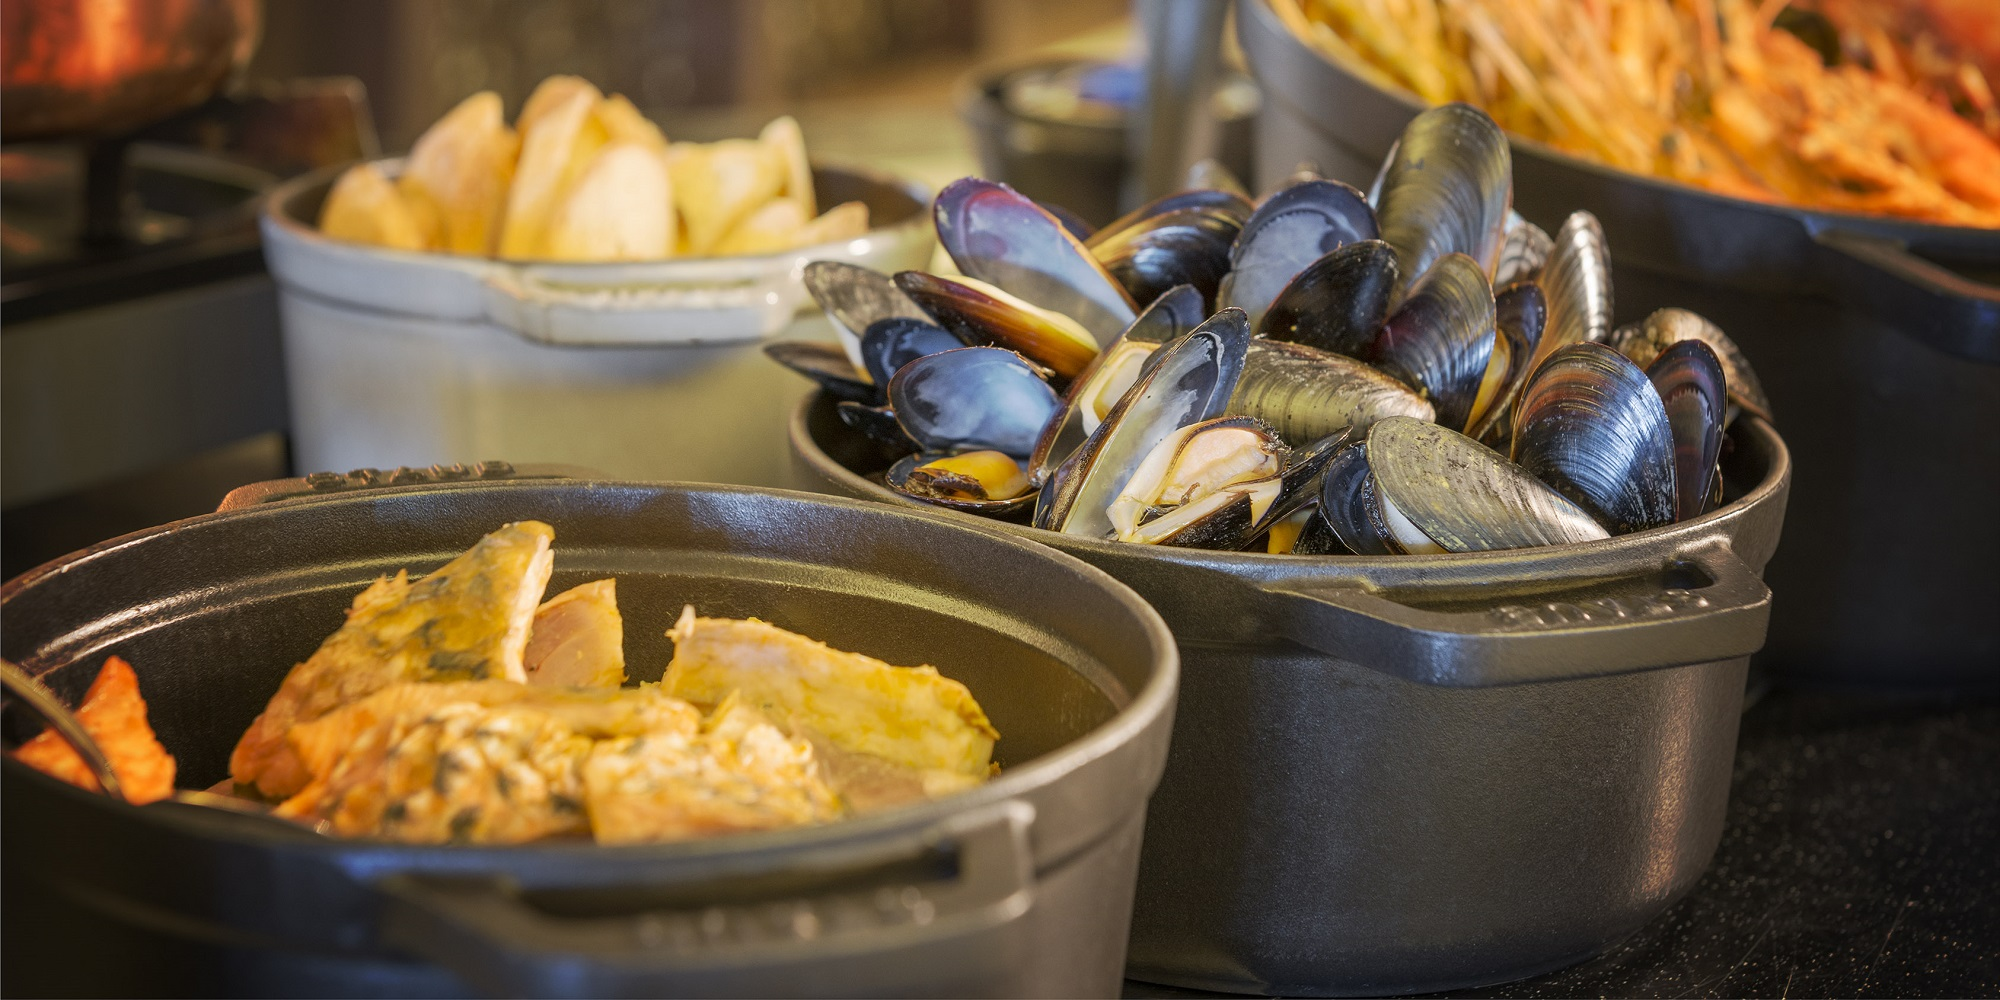 Dubai AOC French Brasserie - Sofitel brunch